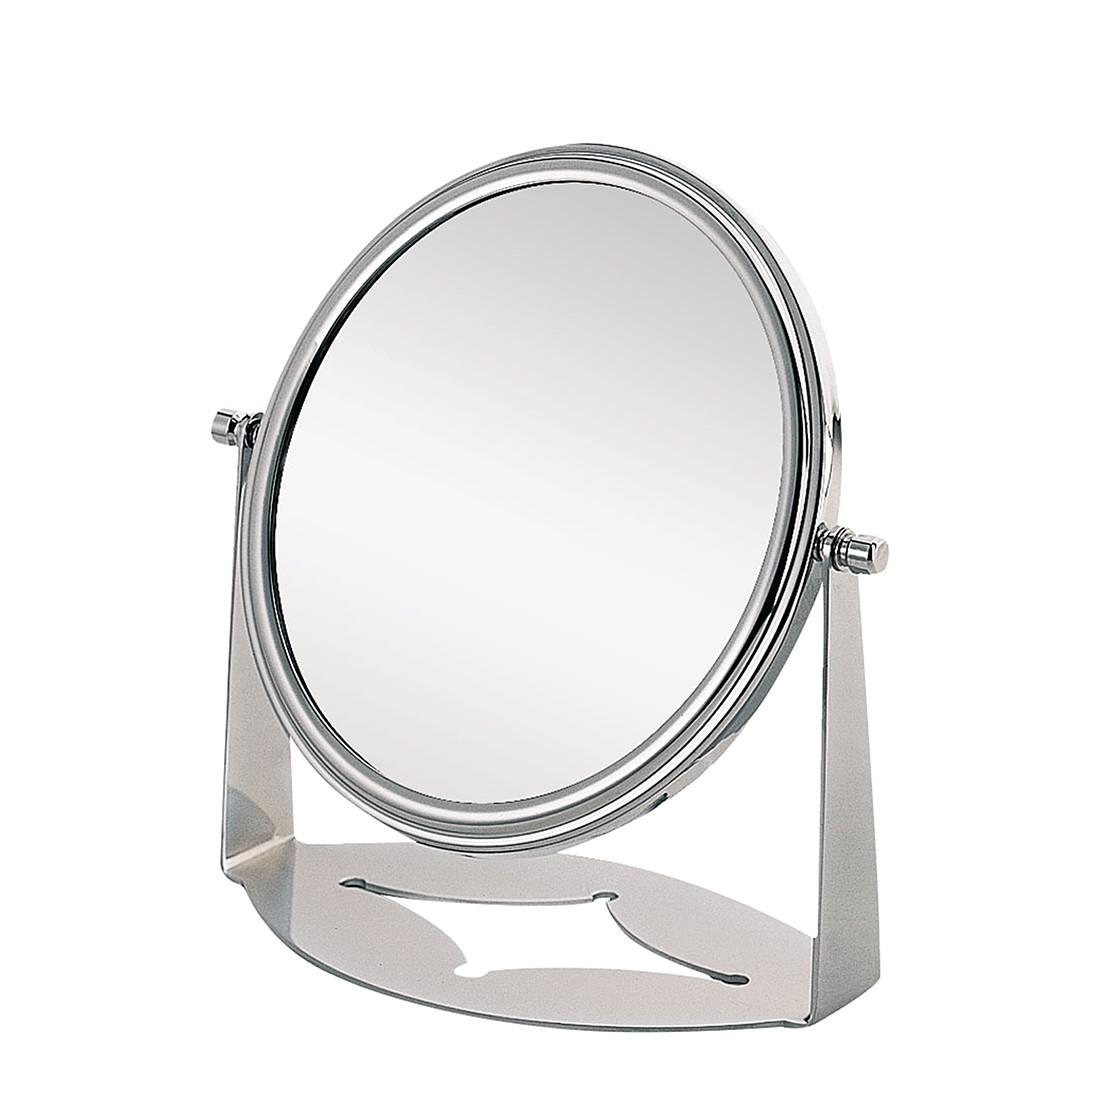 Staande spiegel Claire   chroomkleurig 4 voudige vergroting_ Nicol Wohnausstattungen